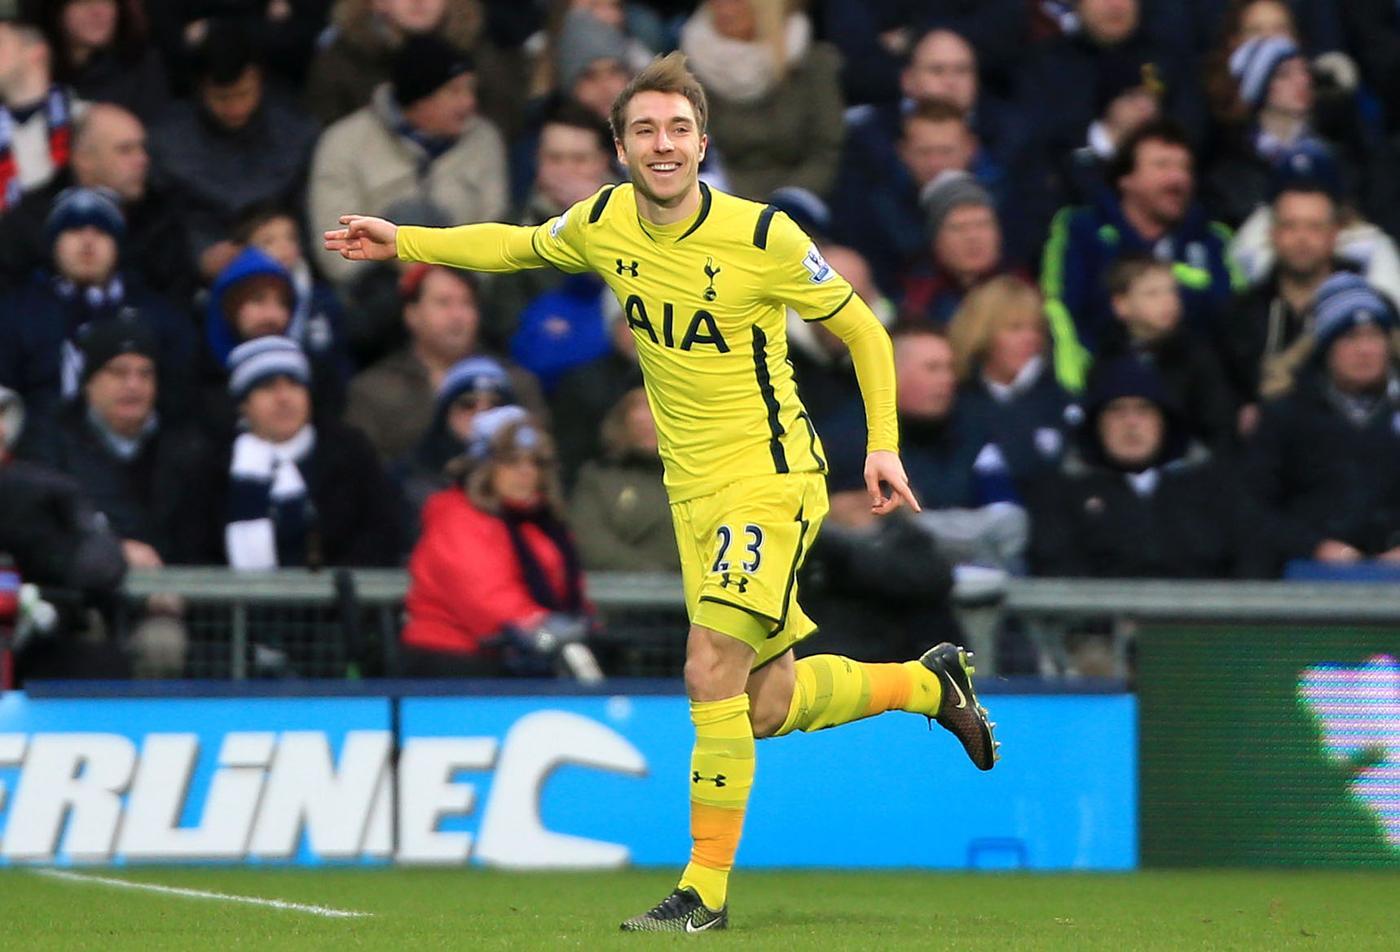 Christian Eriksen to be offered new bumper deal at Tottenham Hotspur